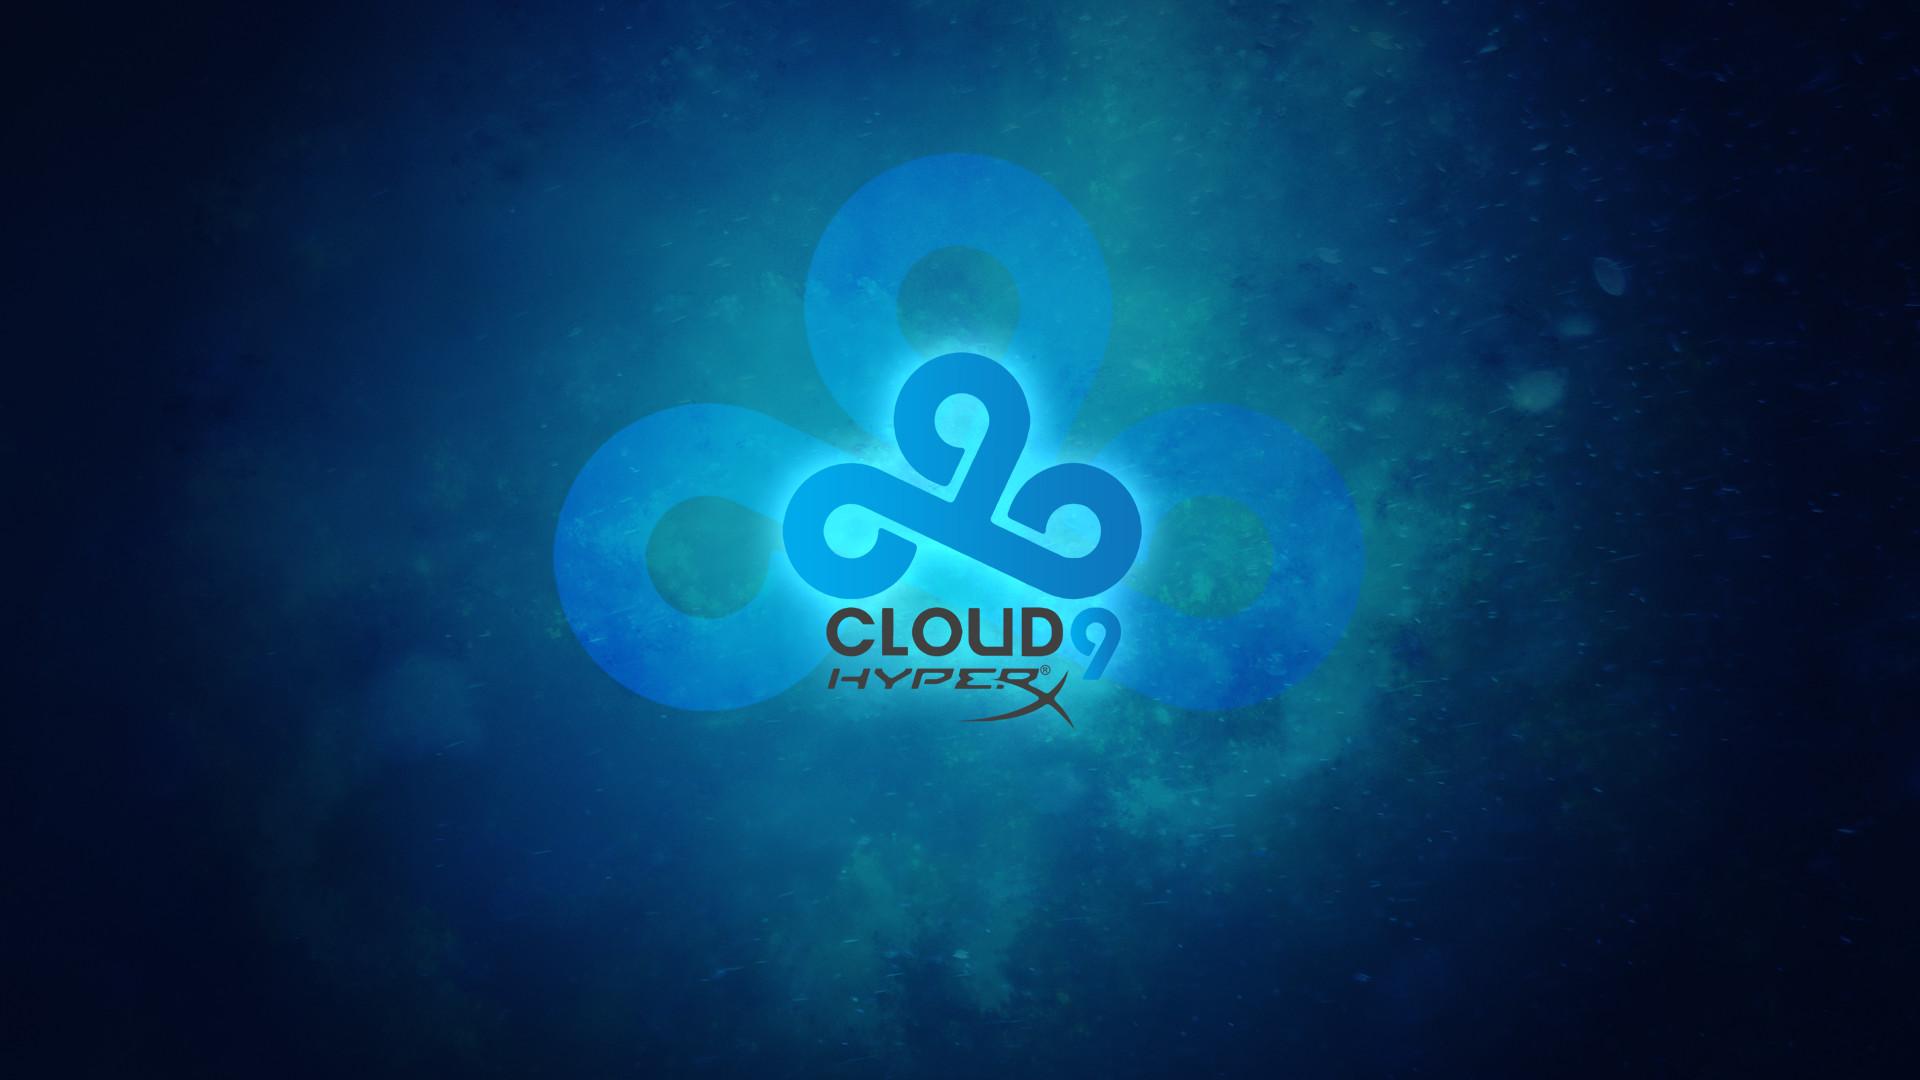 cloud 9 wallpaper by nervyzombie customization wallpaper hdtv .